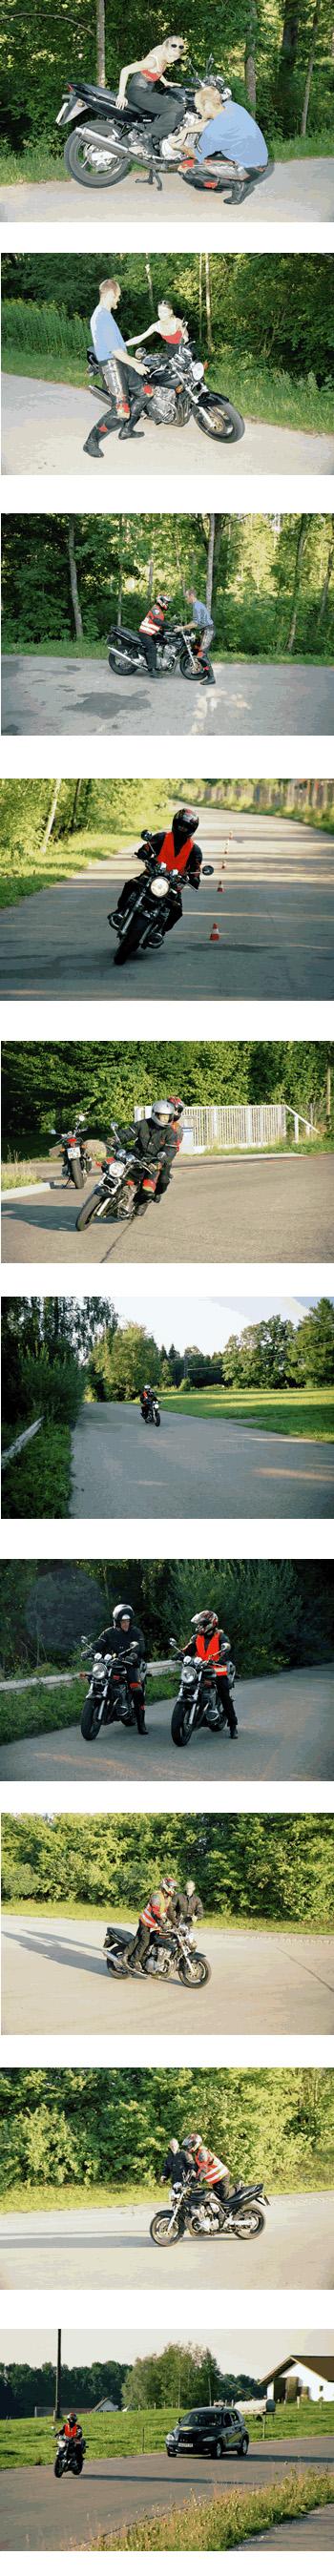 motorradausbildung1